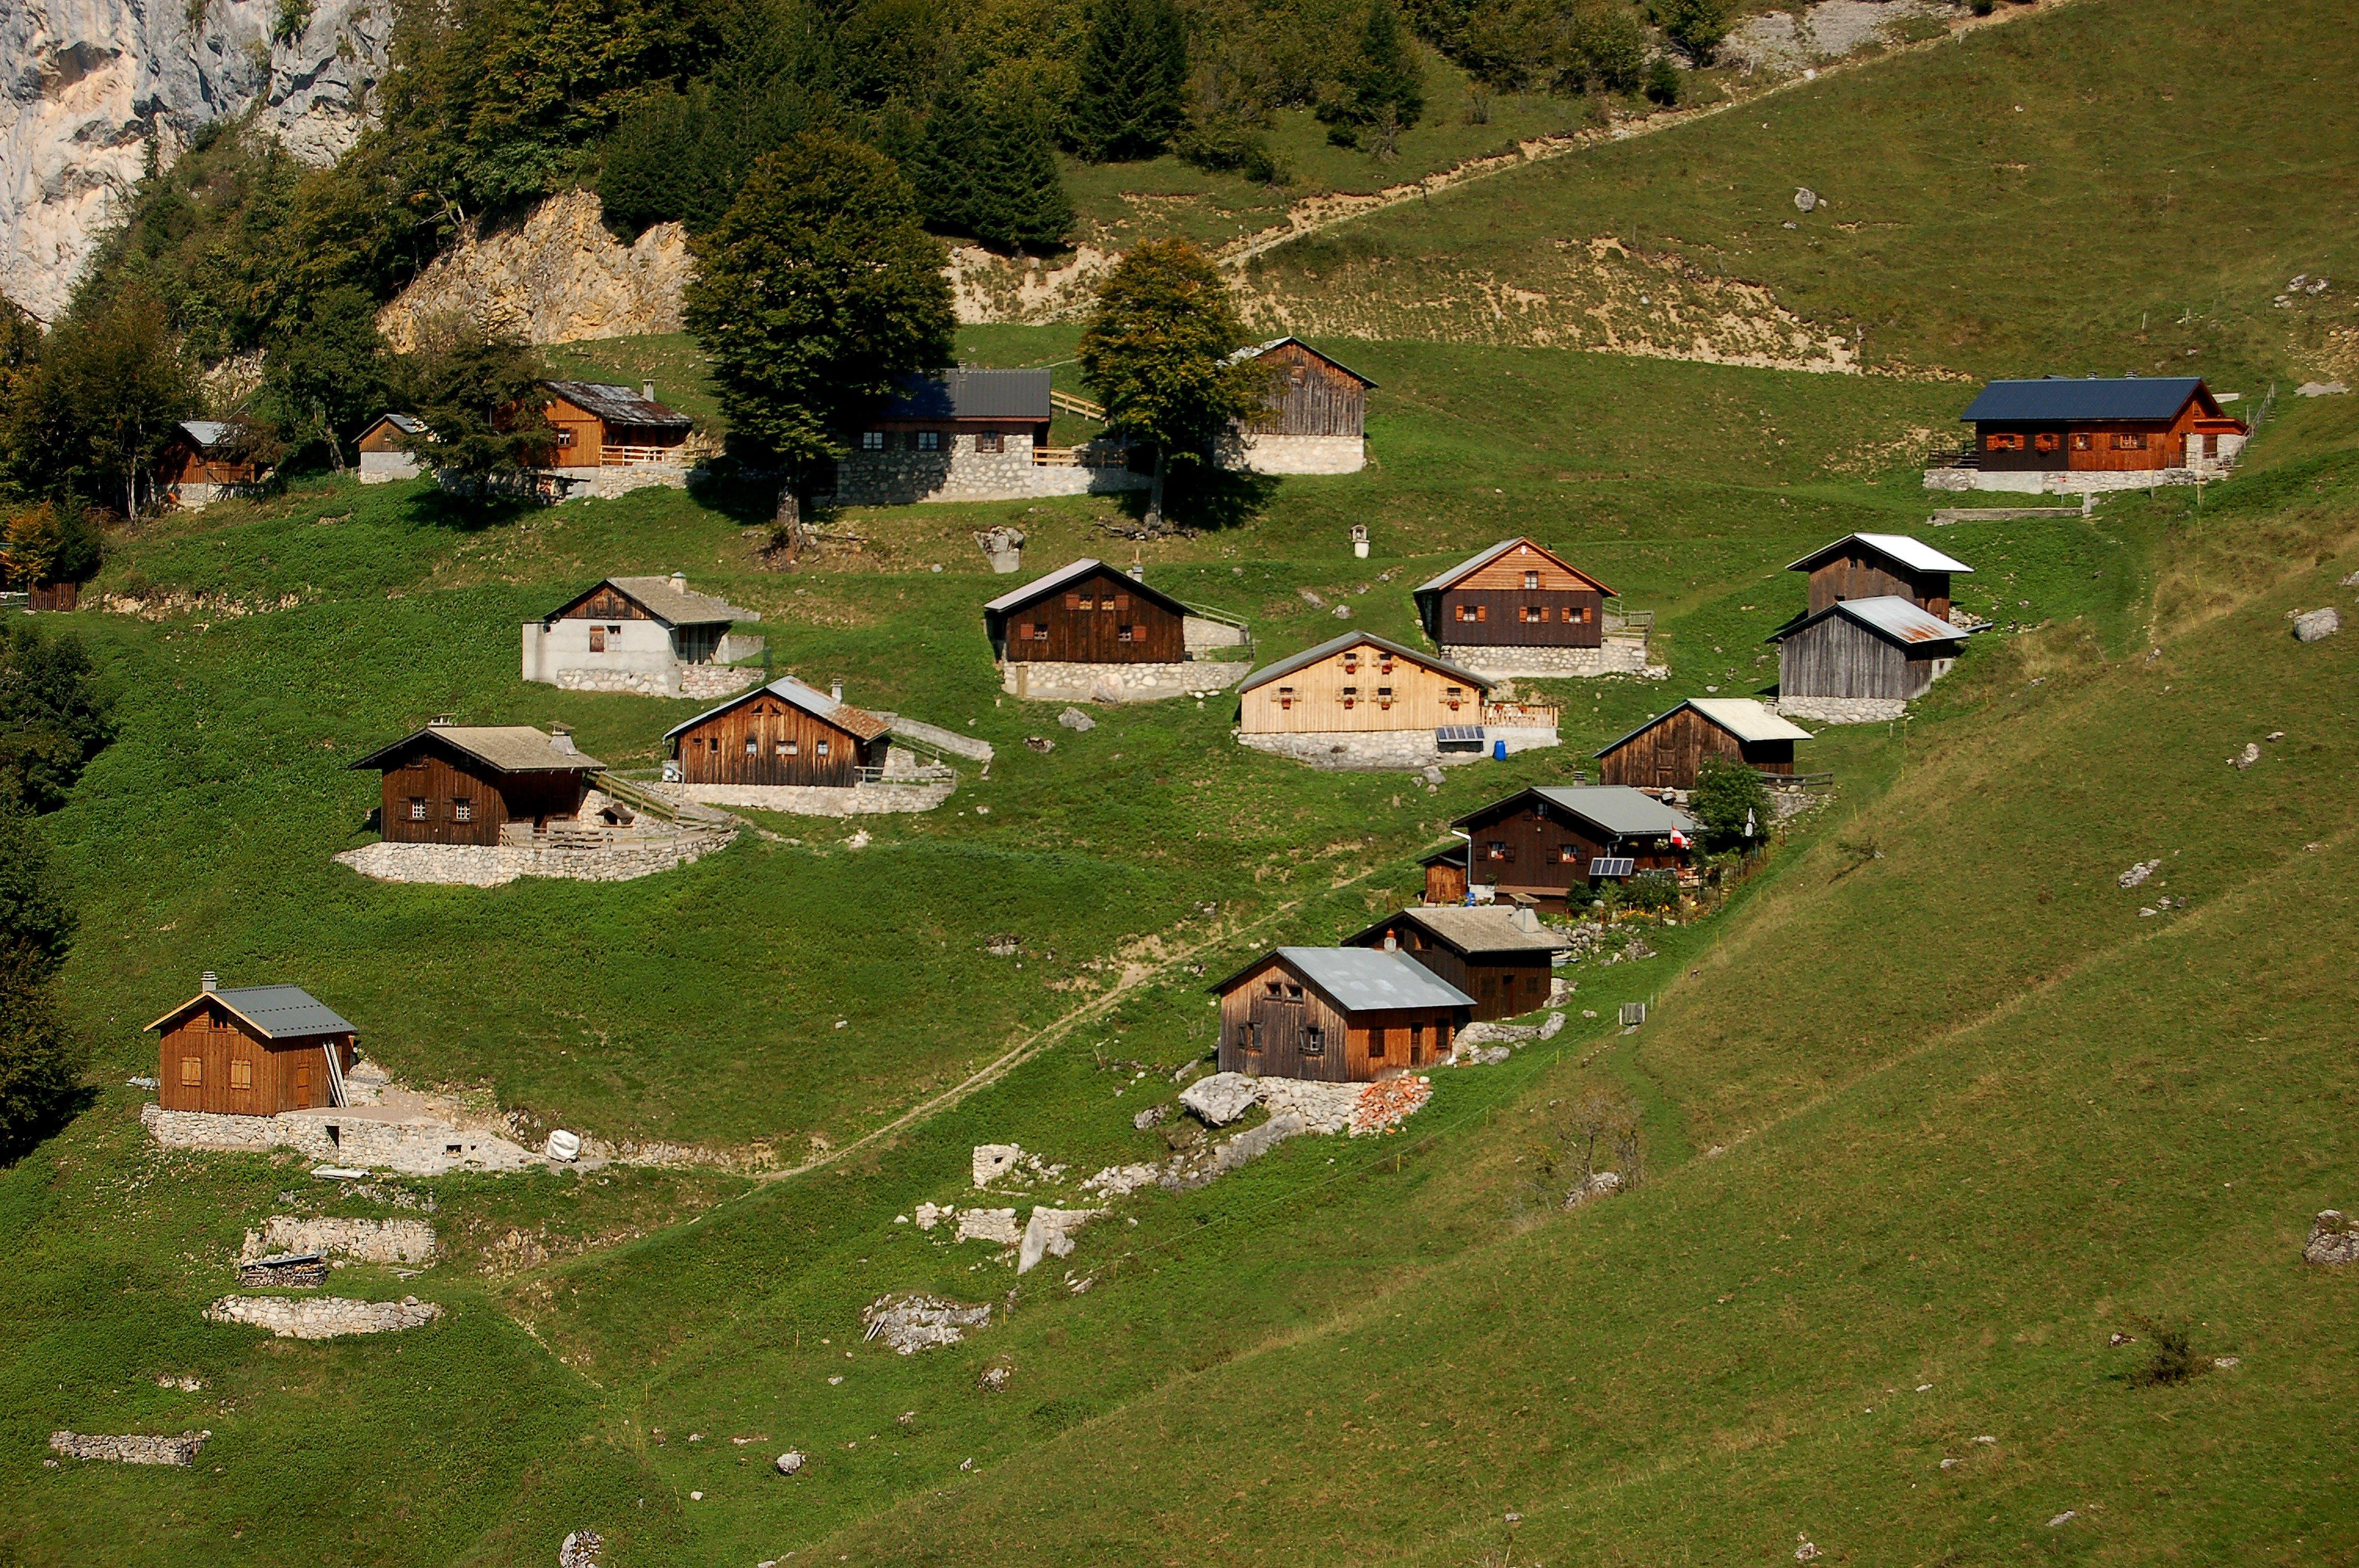 Free stock photo of Montain house, mountain, Zwizerland